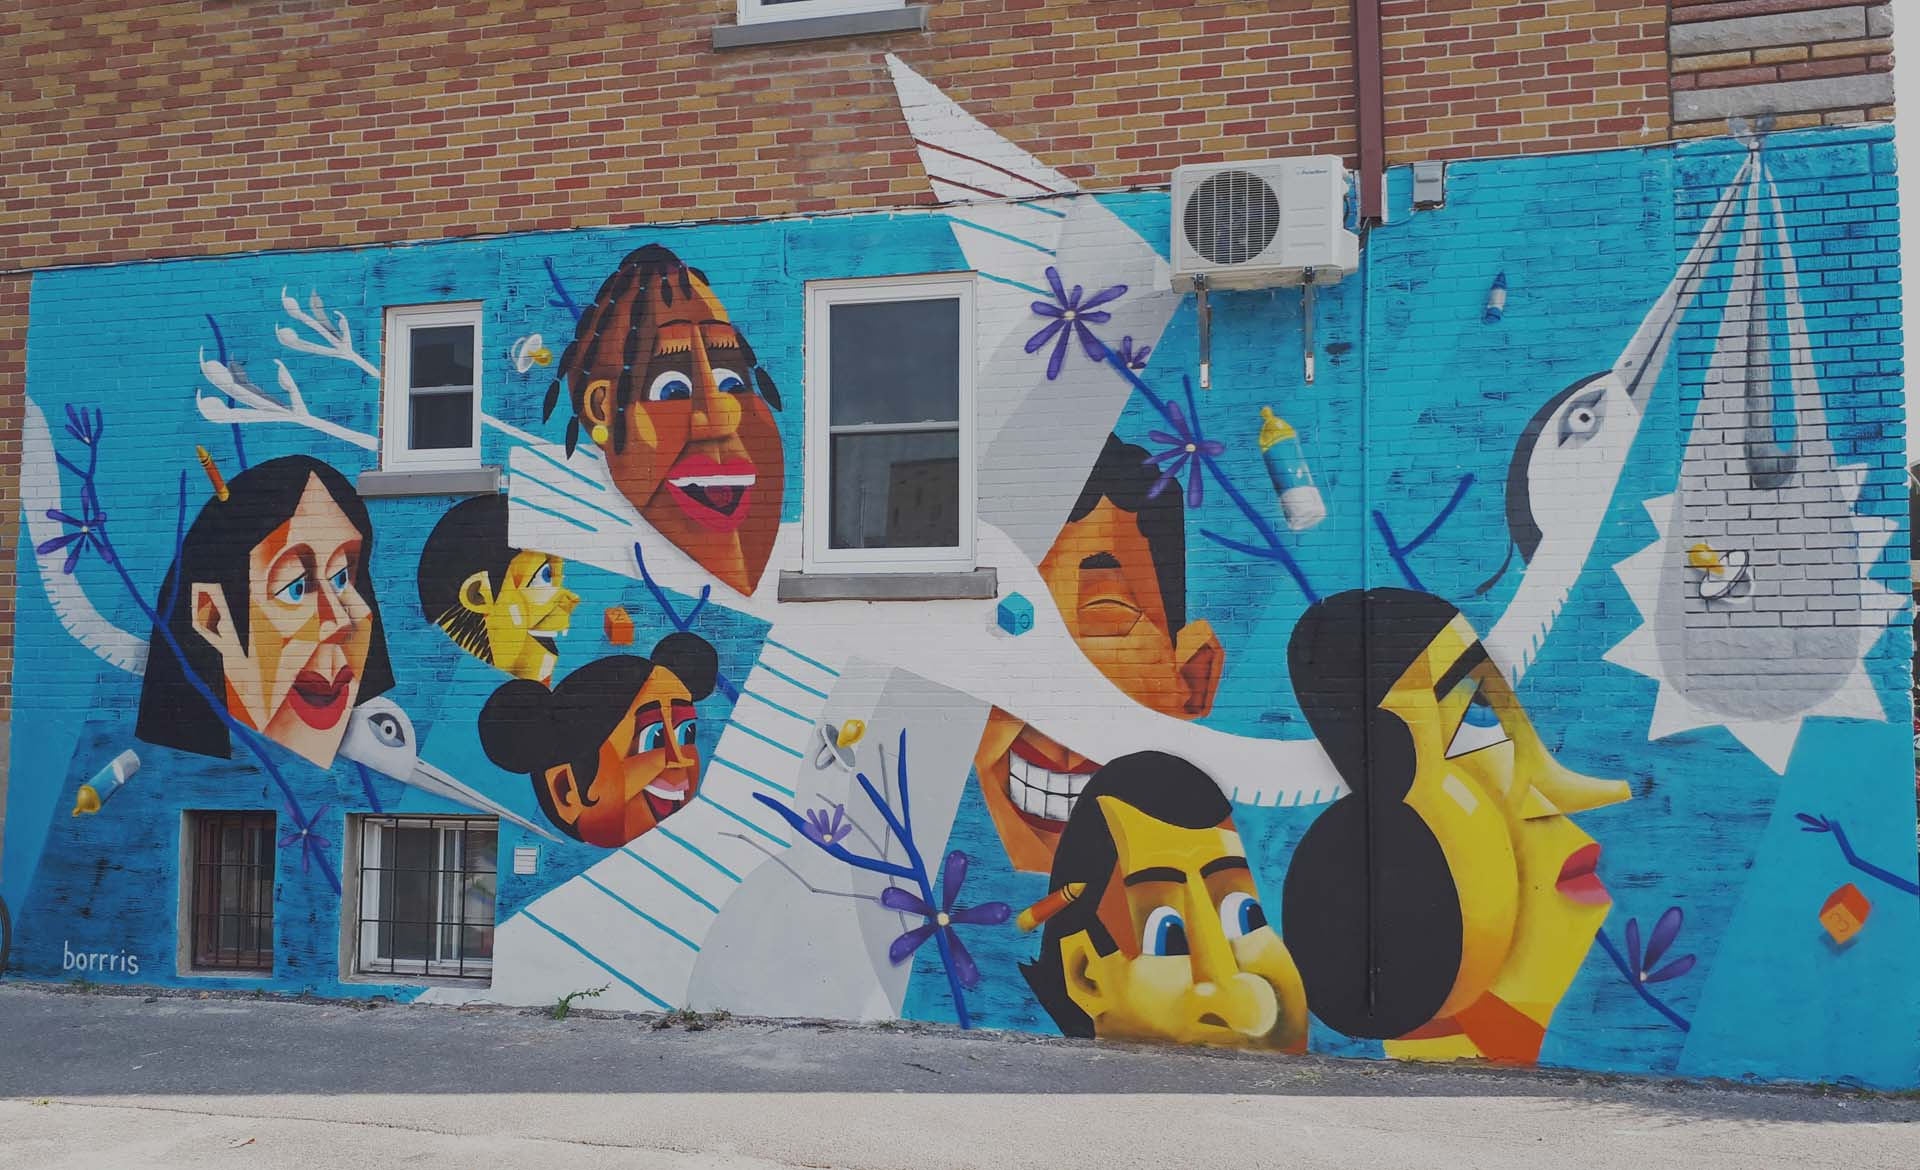 Slider service de création de murales - artiste Borrris